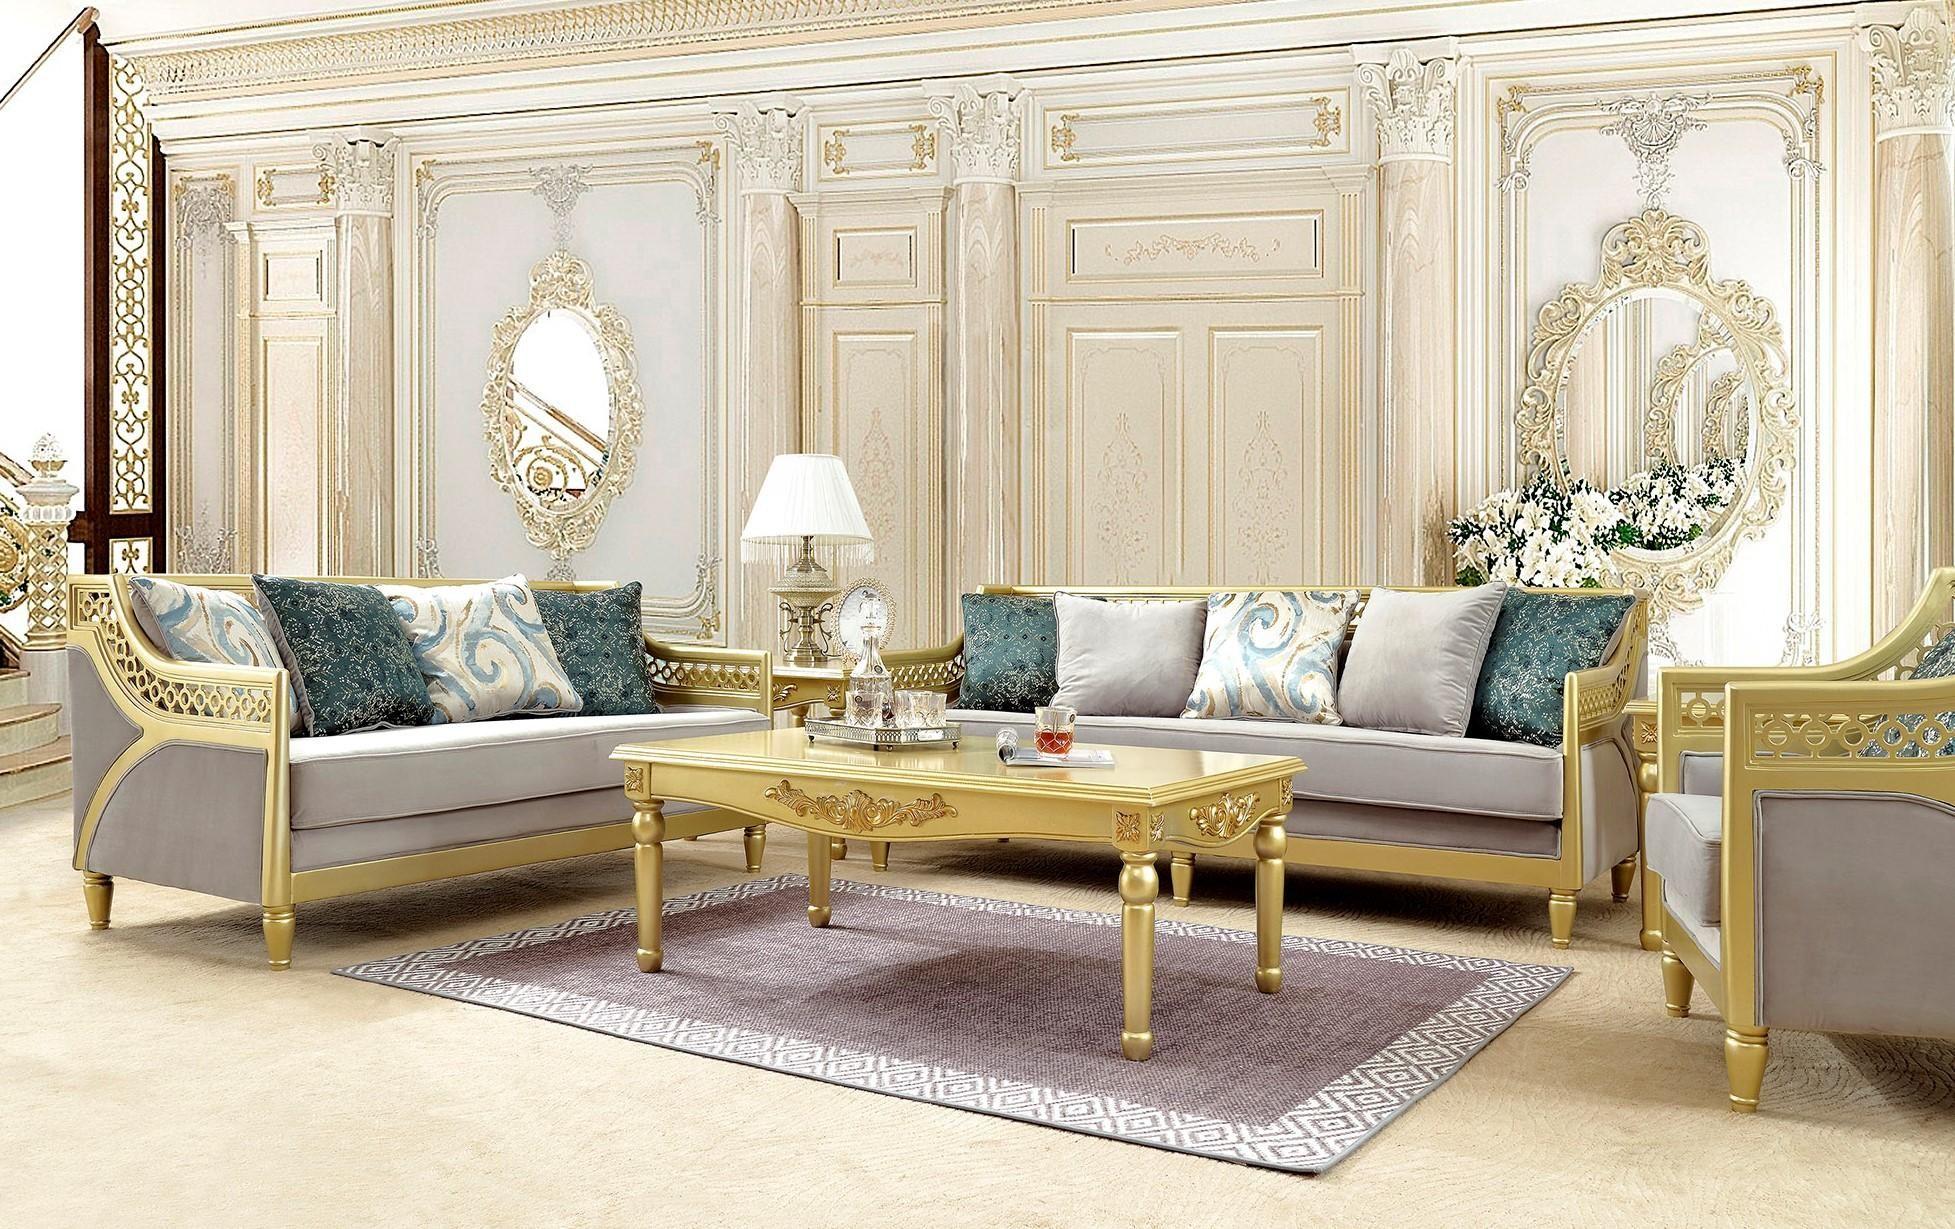 Gray Fabric Metallic Gold Sofa Set 3pcs Traditional Homey Design Hd 2063 Hd 2063 Sset3 Gold Living Room Gold Sofa Furniture Sofa Set